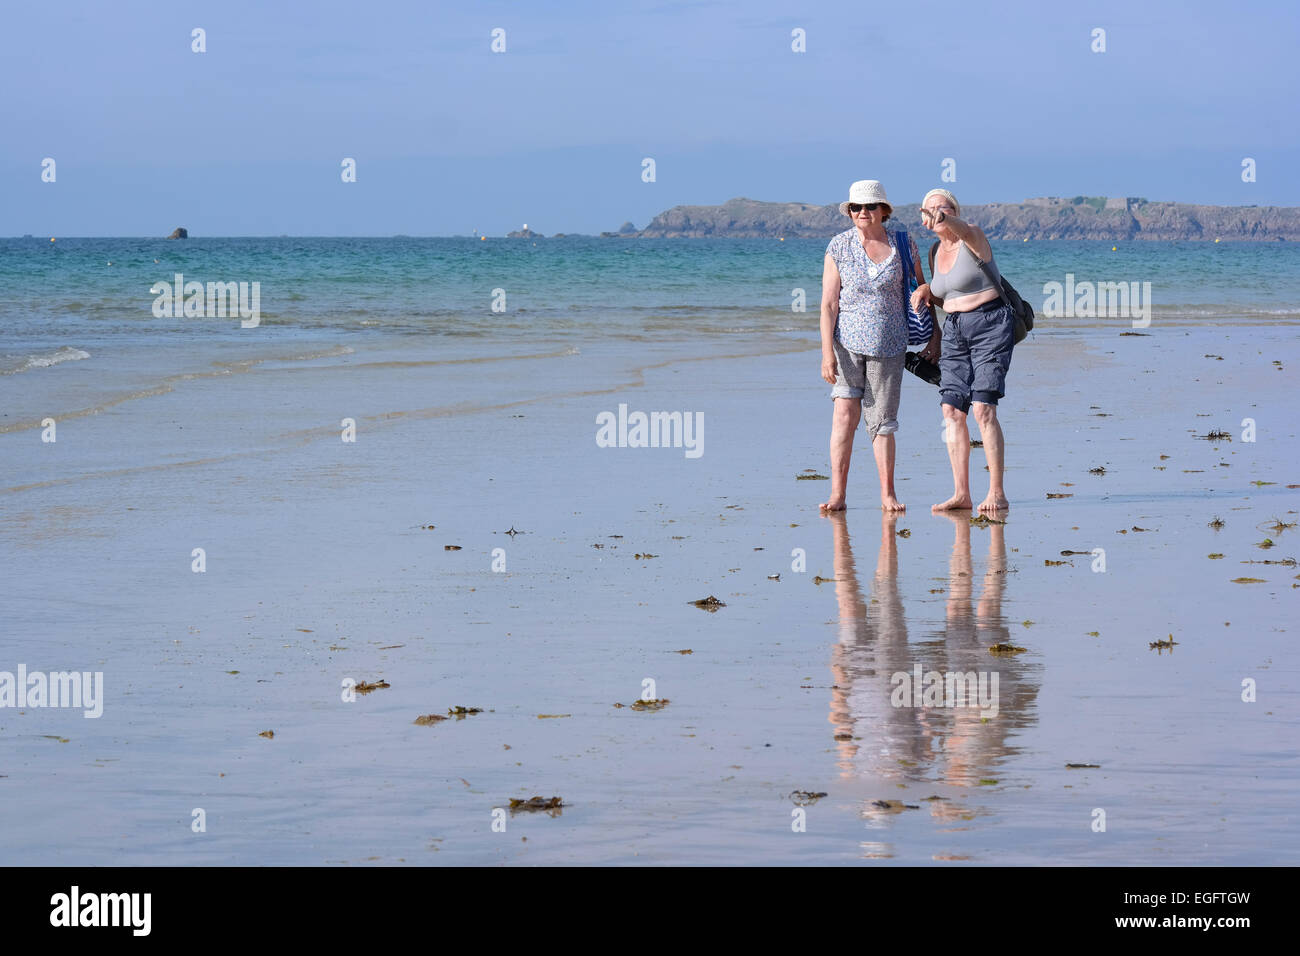 FRANCE - JULY 2014  Senior beach walking ladies at seashore in Saint-Malo, Brittany, France - Stock Image